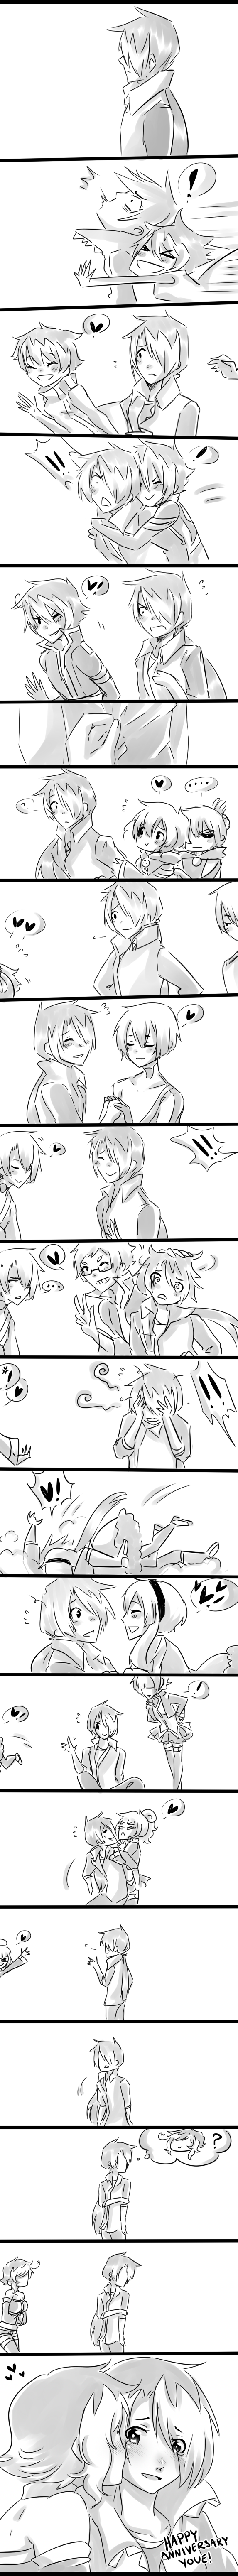 :Happy:Anniversary:Youe: by KaiSuki